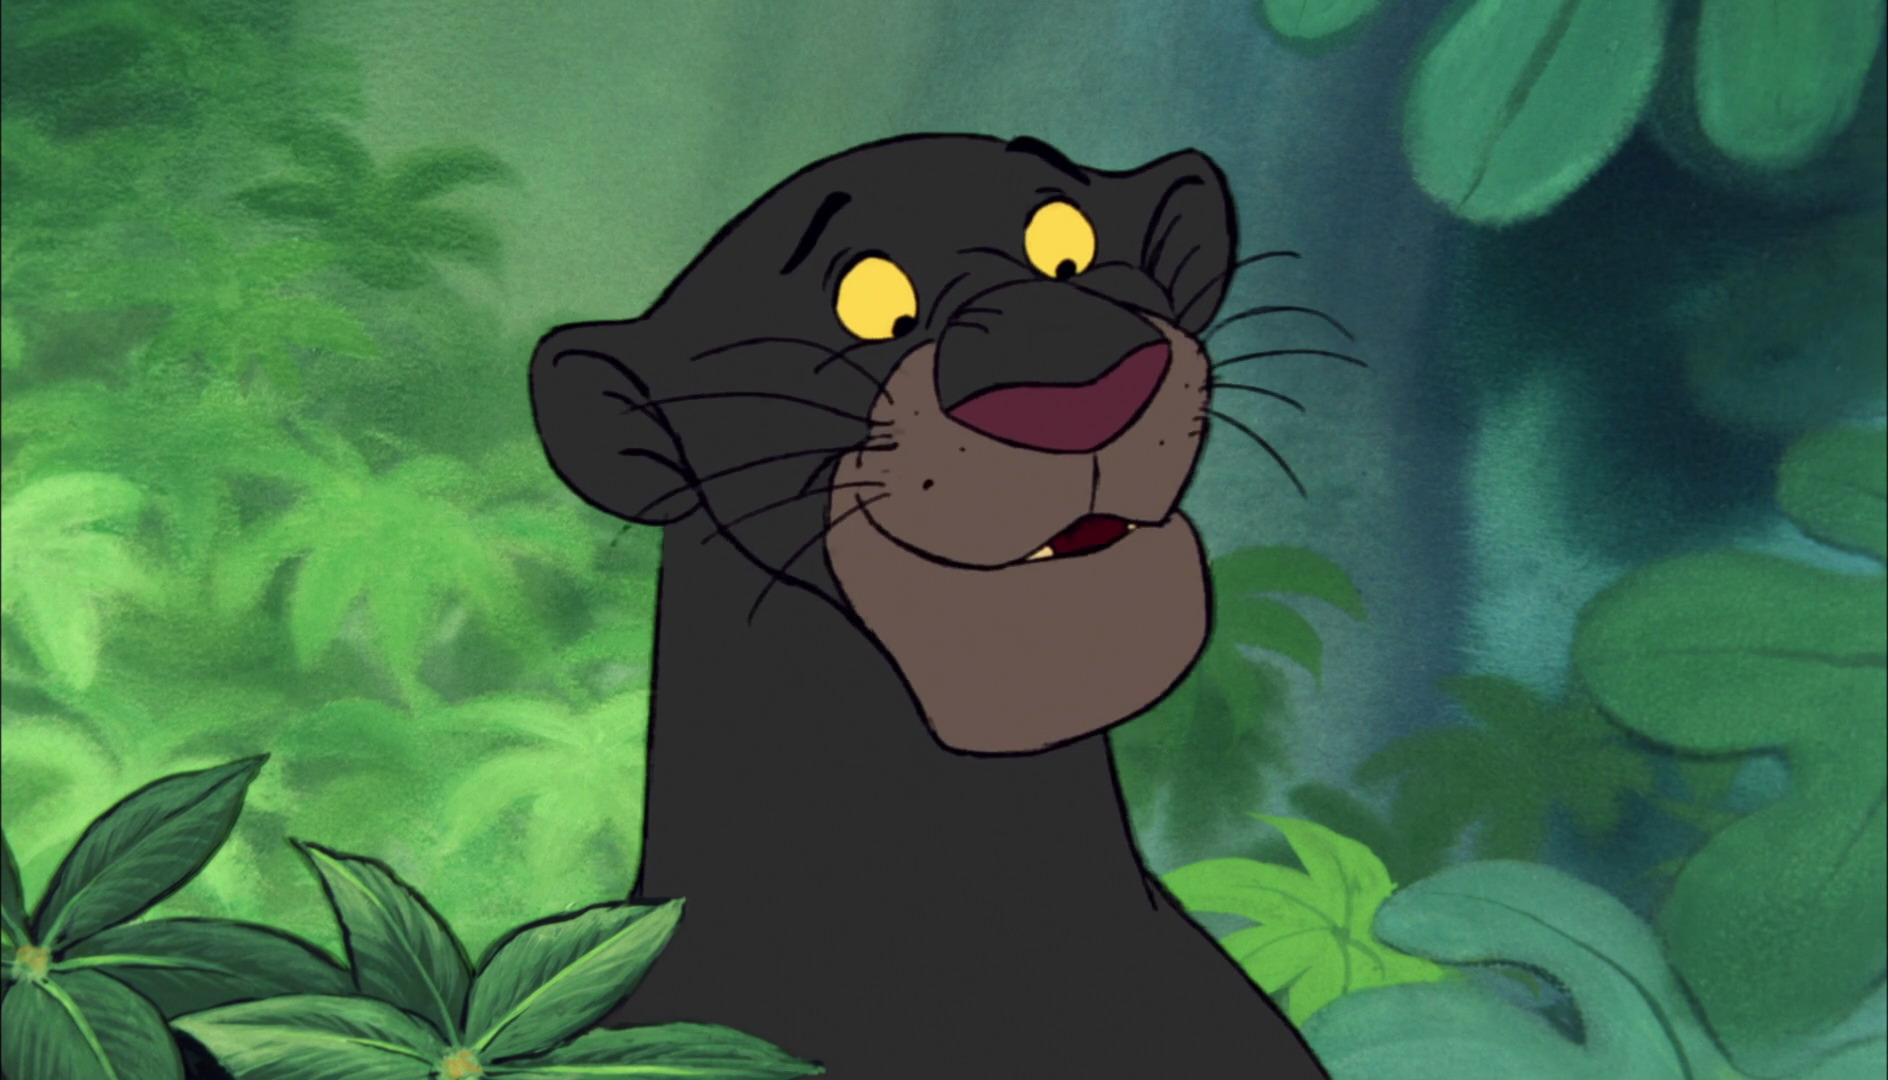 Bagheera Personnage Dans Le Livre De La Jungle Disney